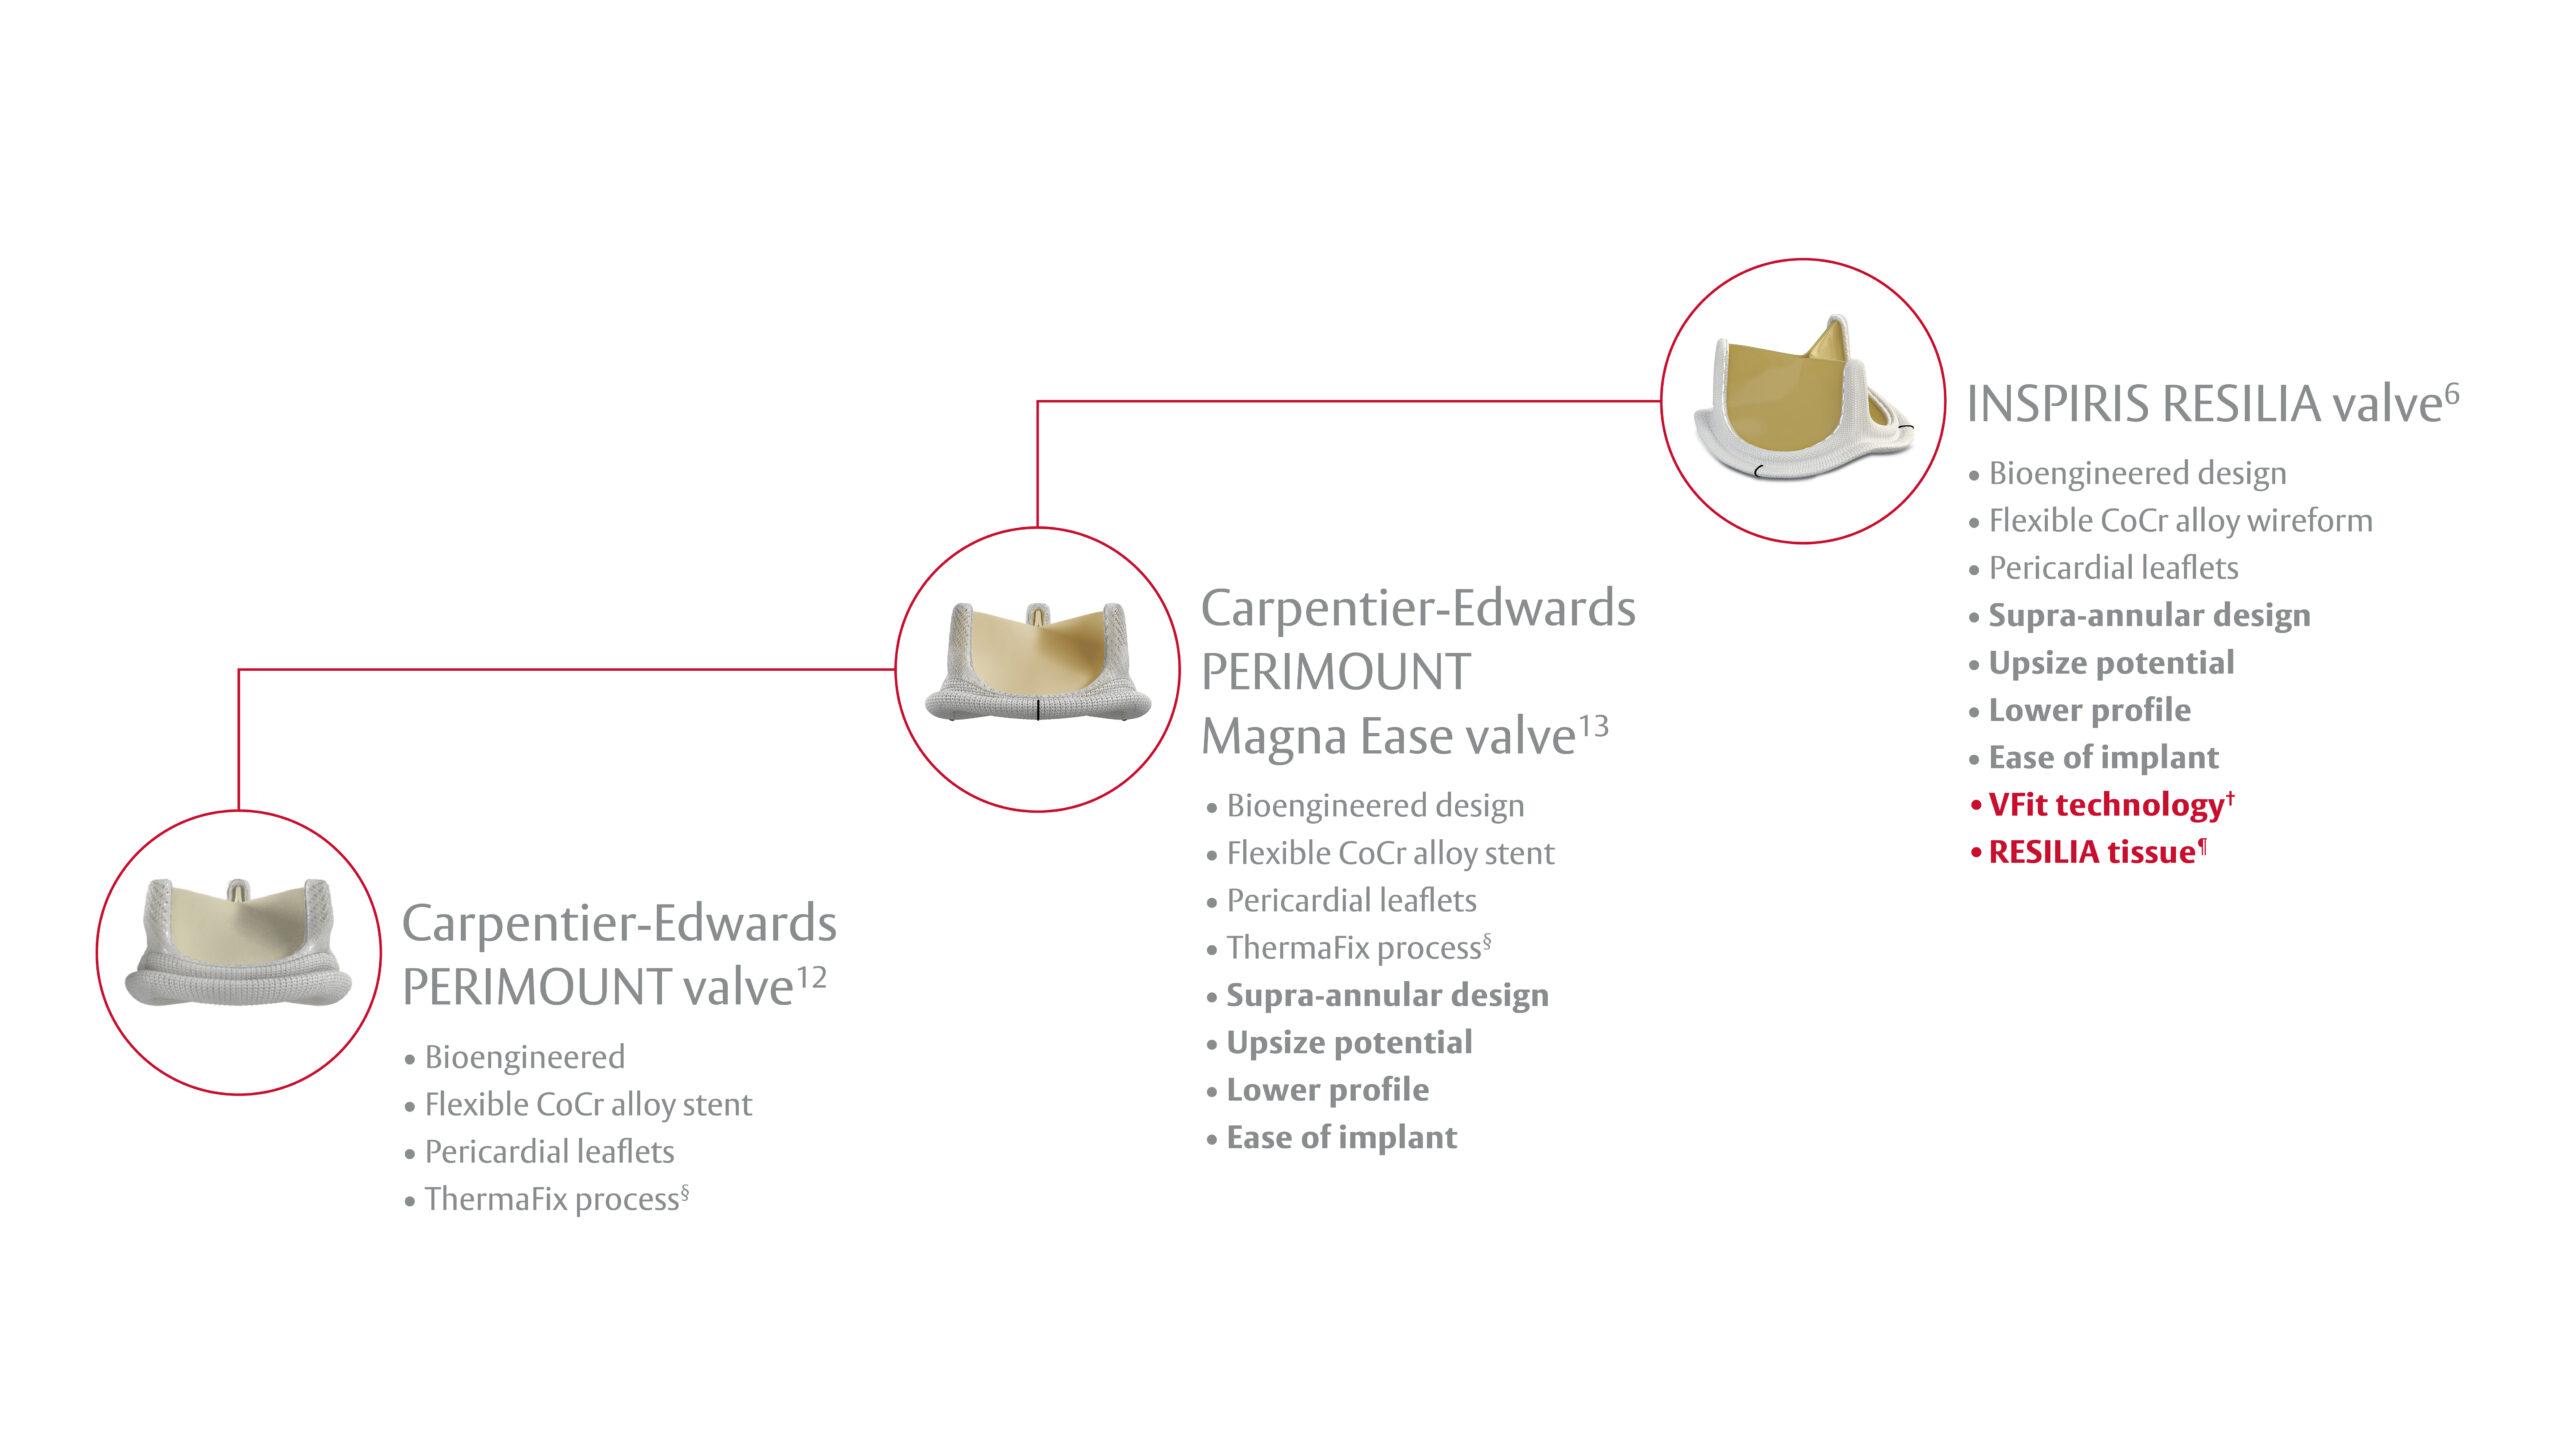 Carpentier-Edwards PERIMOUNT valve portfolio